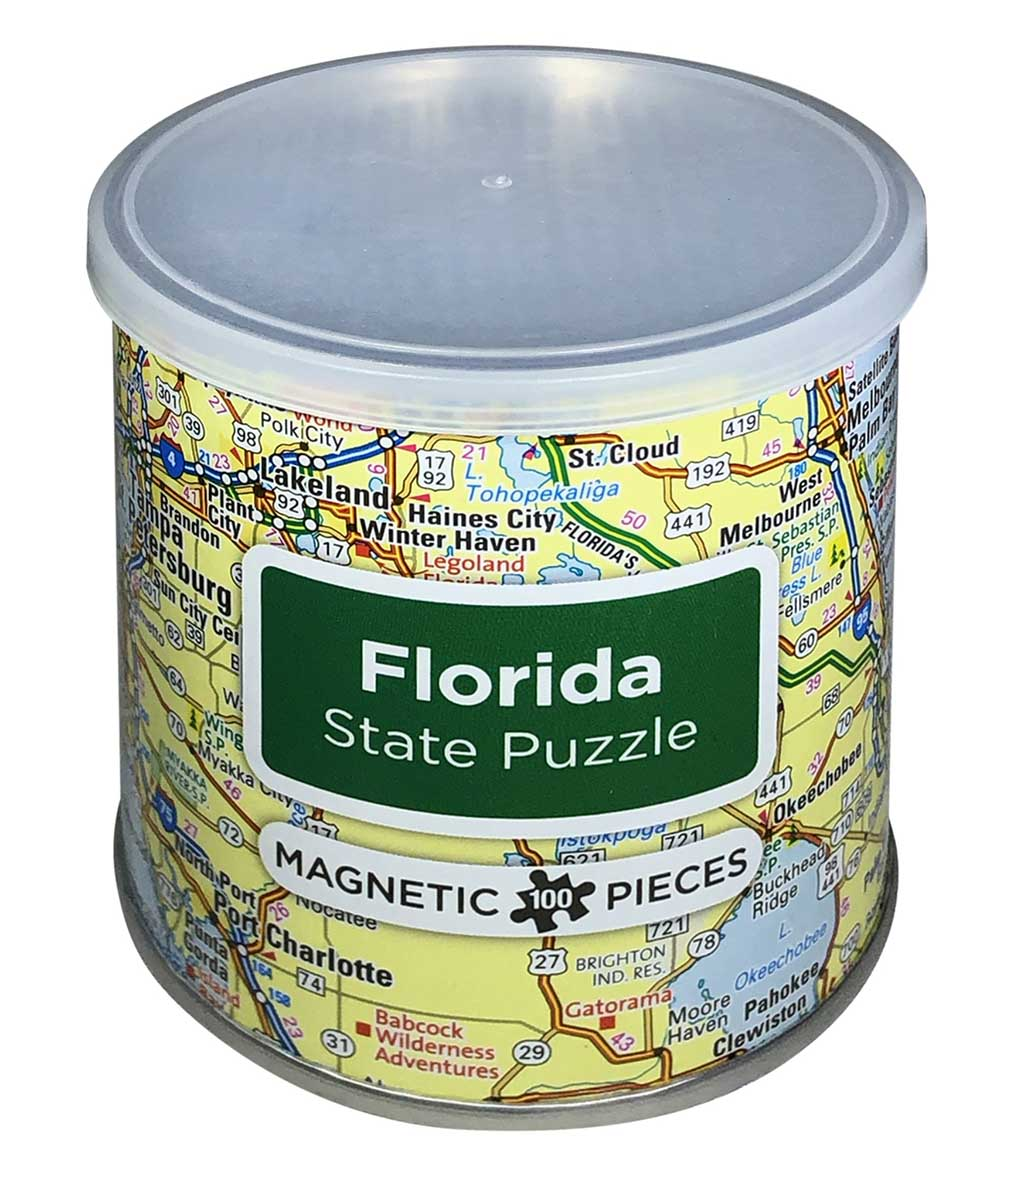 Magnetic Puzzle Florida Travel Jigsaw Puzzle